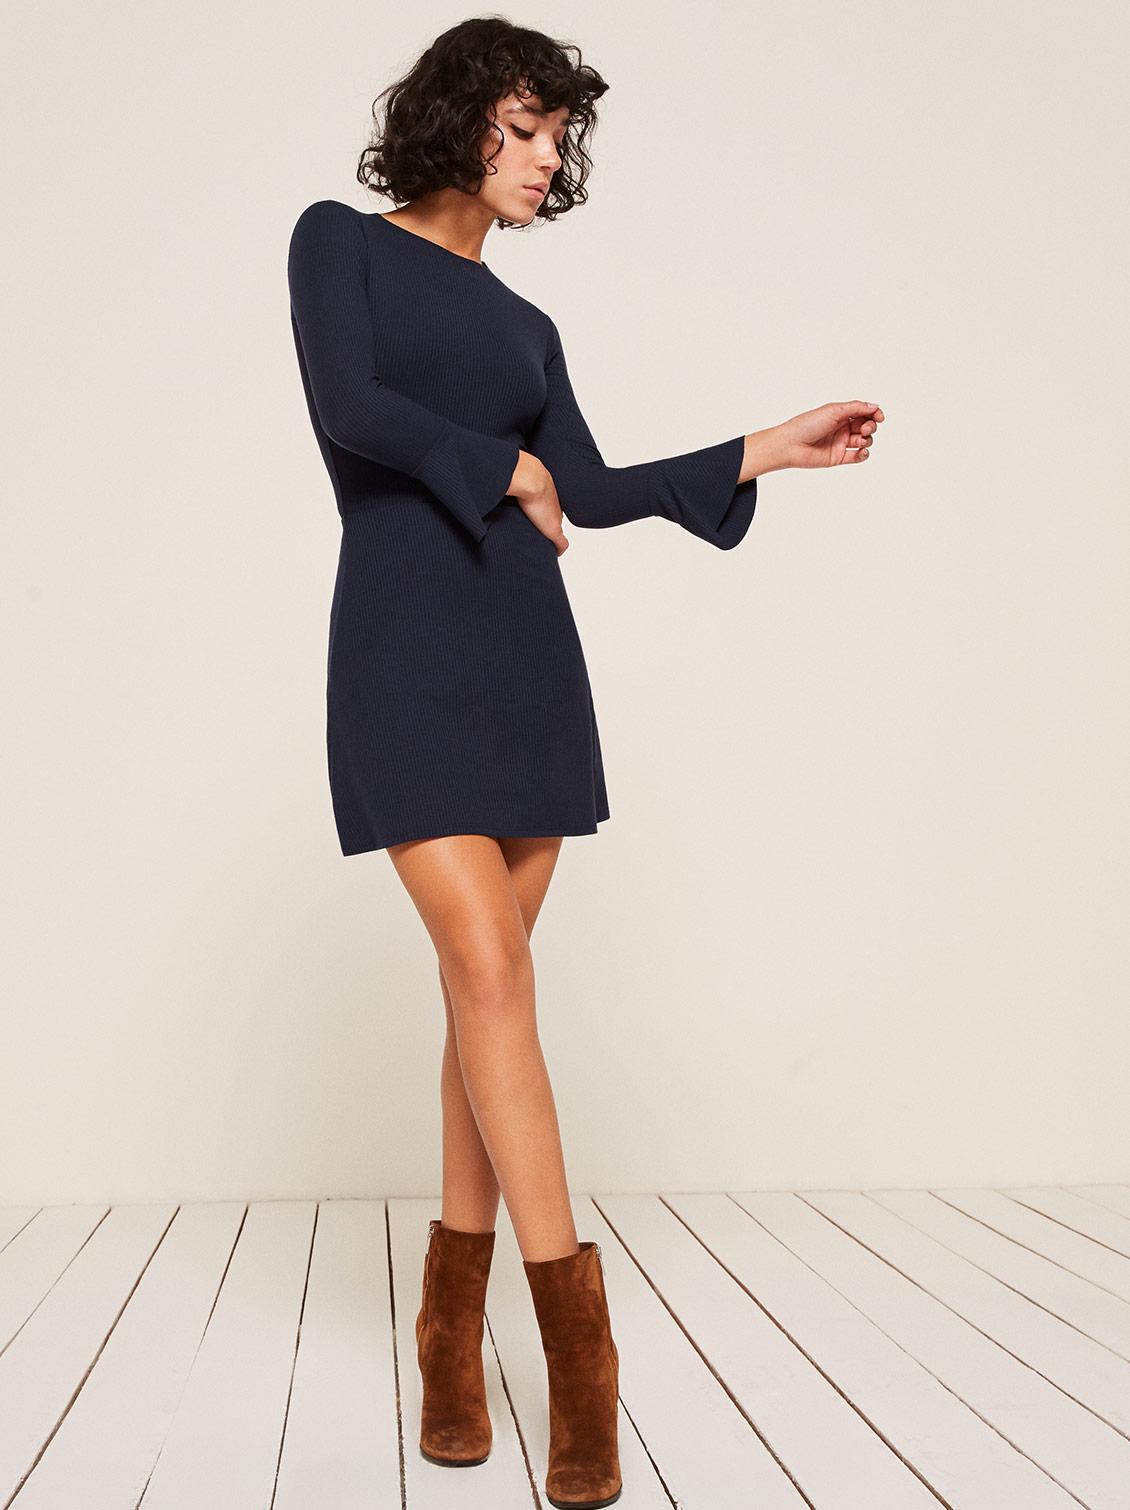 World Threads Traveler, Trusted Brands Women's Fashion Reformation